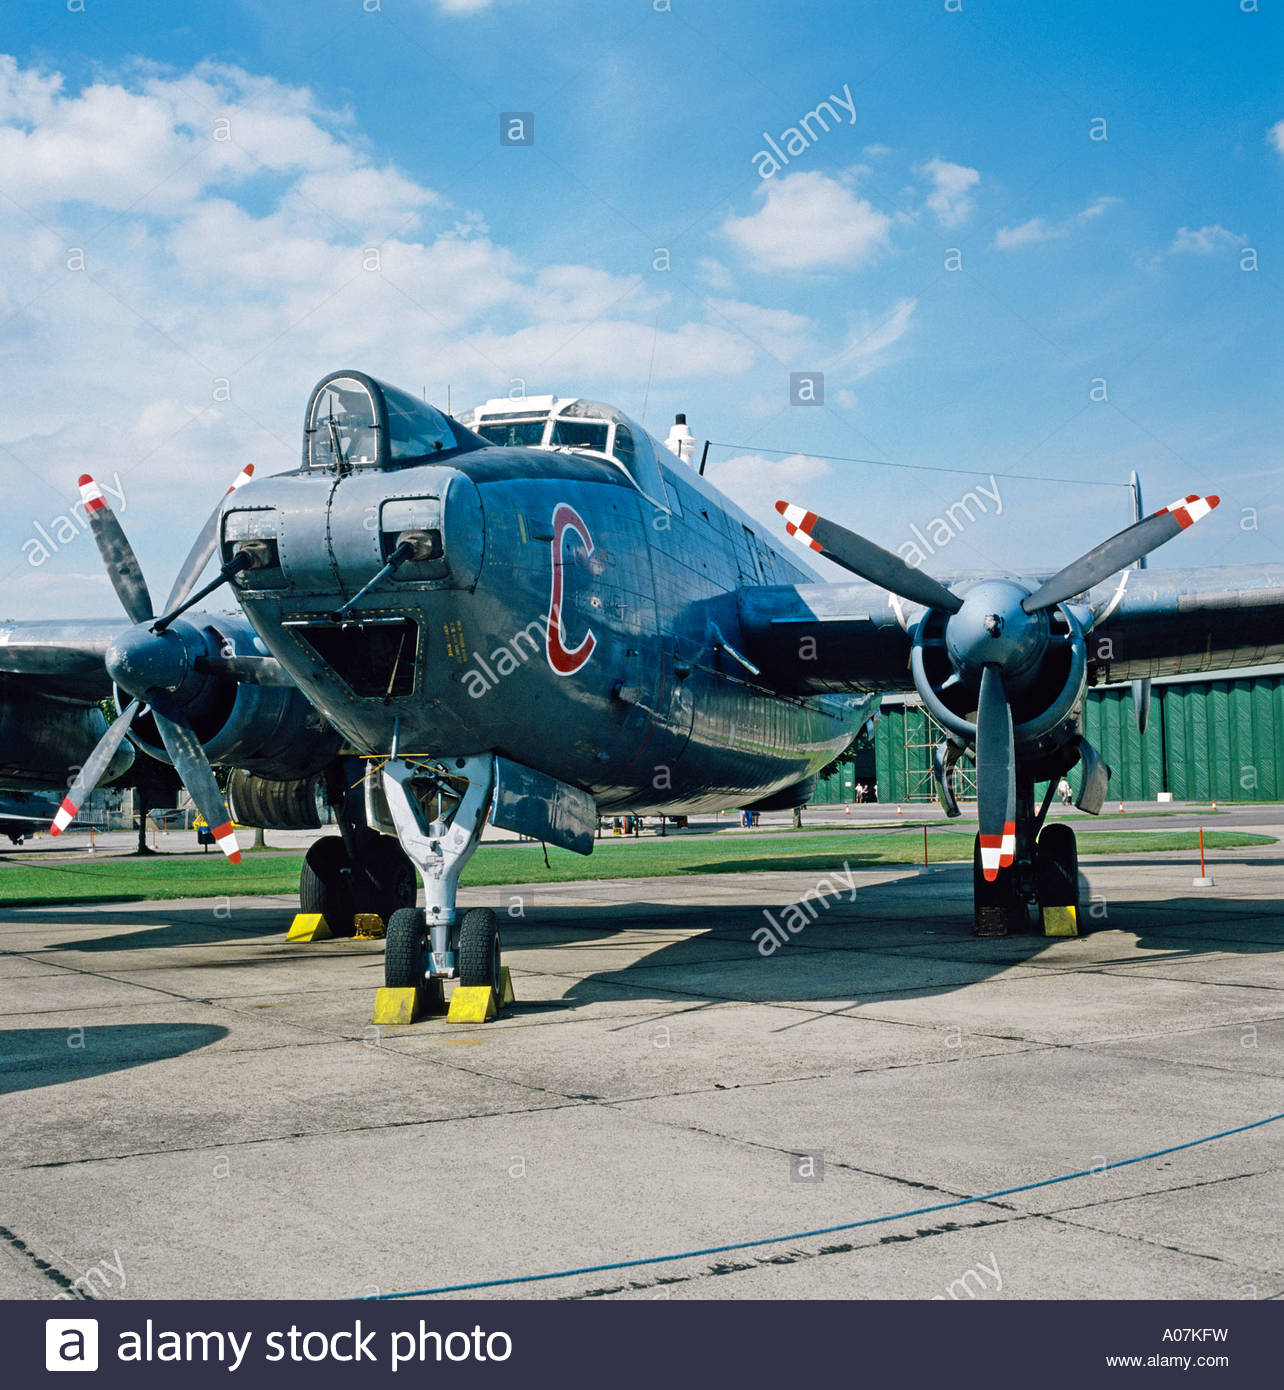 Avro Shackleton Mr 3 Xf708 Maritime Reconnaissance Aircraft Ex 201.